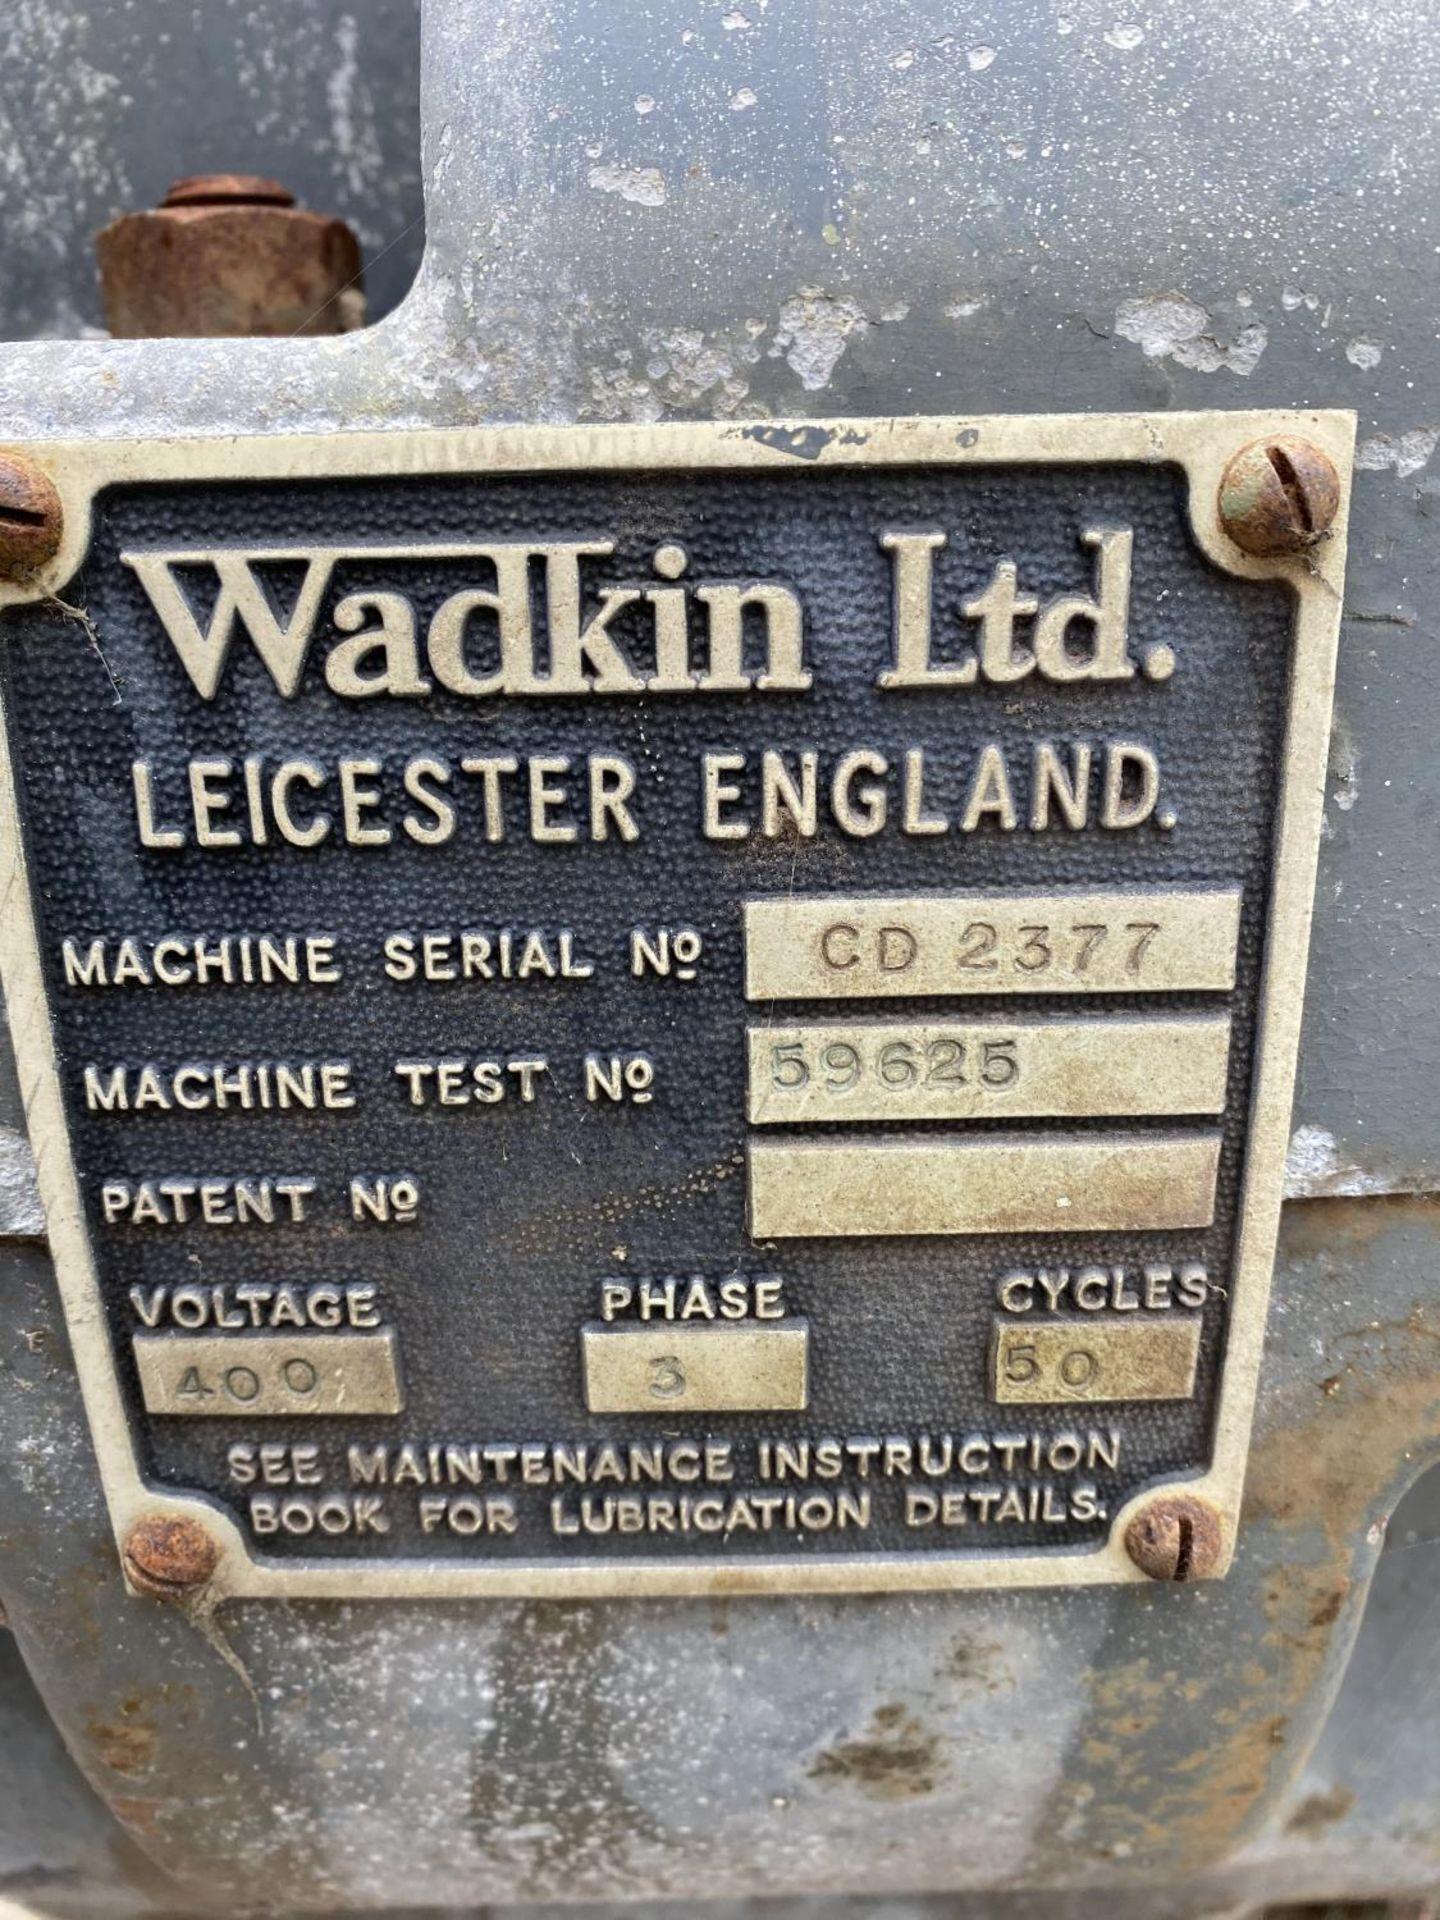 A WADKIN LTD. 3 PHASE SAW - BELIEVED WORKING NO WARRANTY - NO VAT - Image 2 of 4